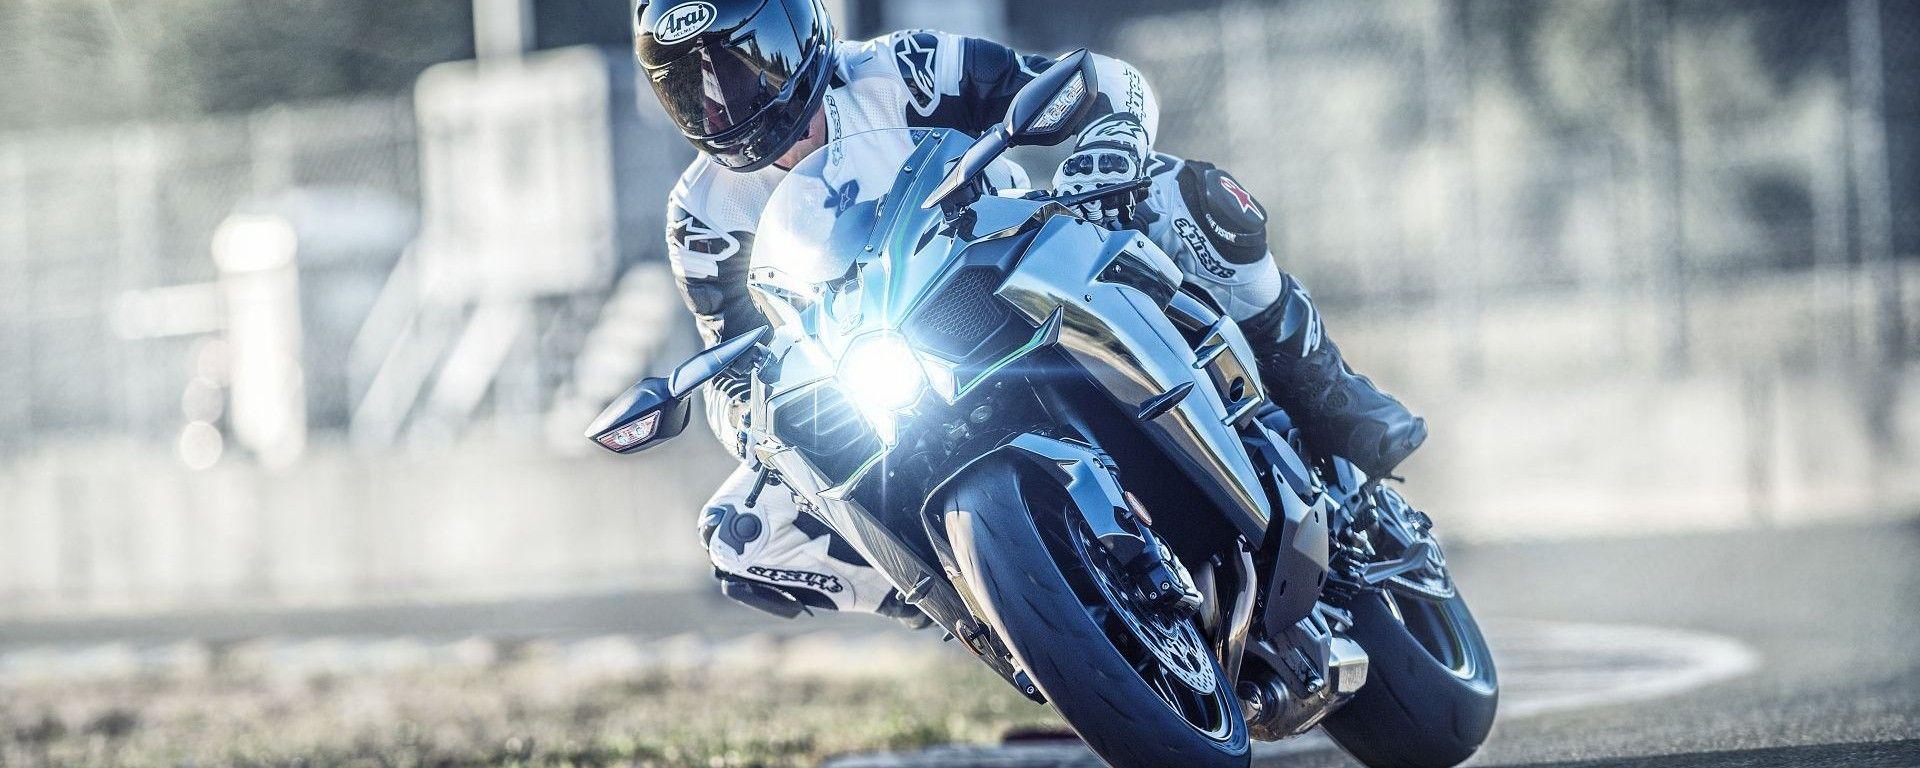 Kawasaki Ninja H2 2019: vista frontale